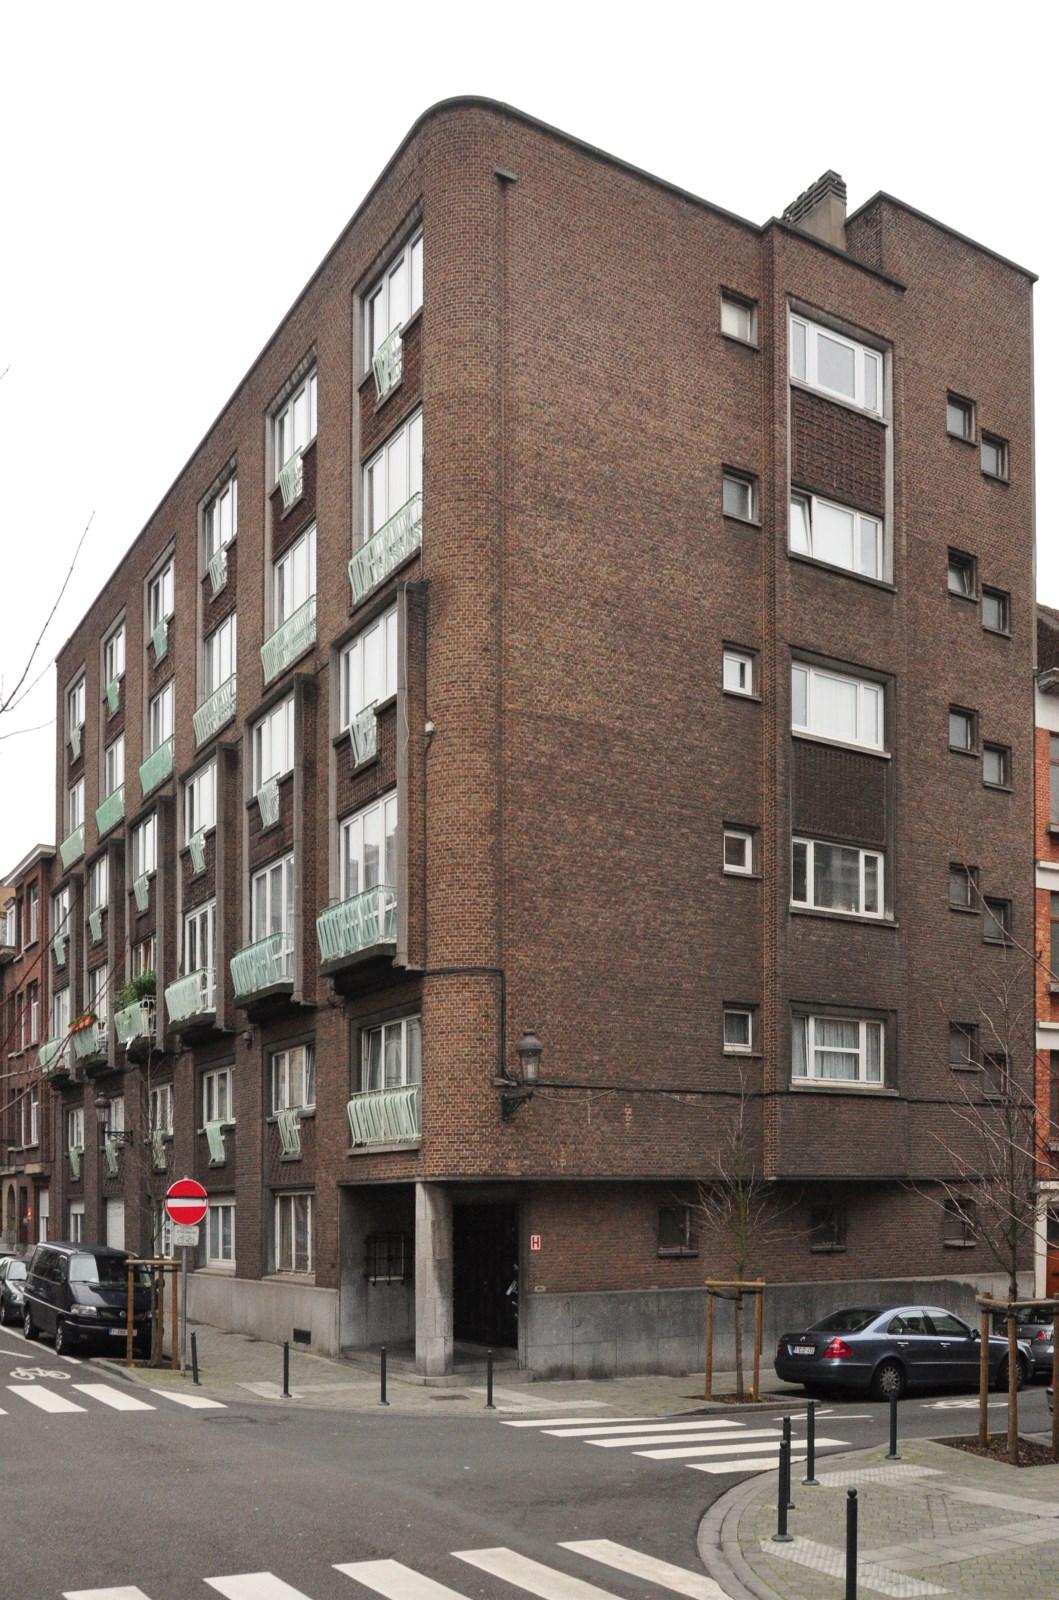 Rue Max Roos 26-28, 2012